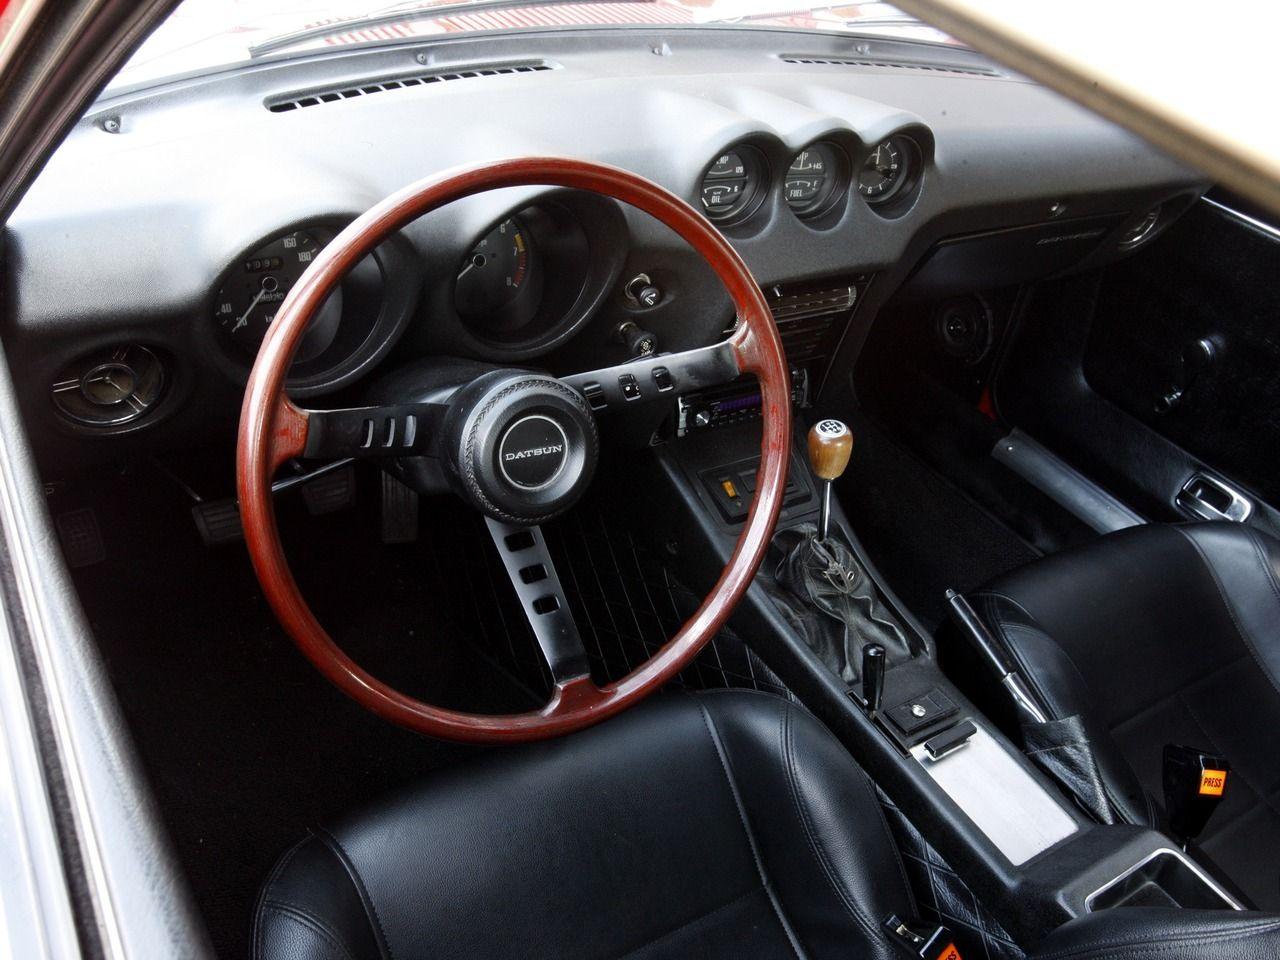 1969 datsun 240z datsun nissan pinterest datsun 240z cars and nissan. Black Bedroom Furniture Sets. Home Design Ideas